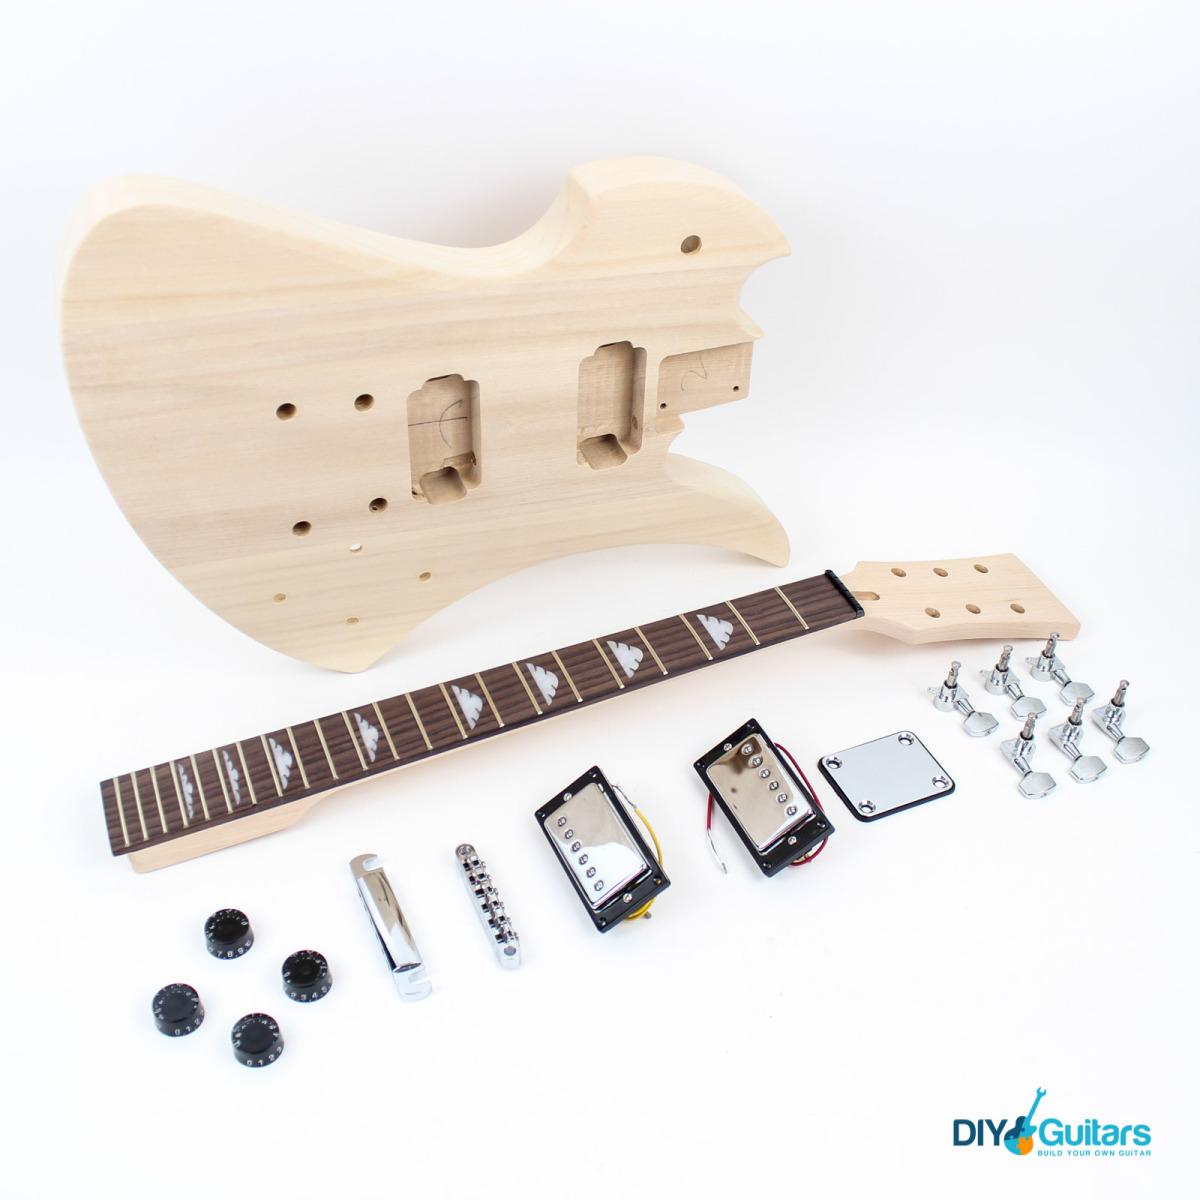 richbird diy guitar kit diy guitars. Black Bedroom Furniture Sets. Home Design Ideas